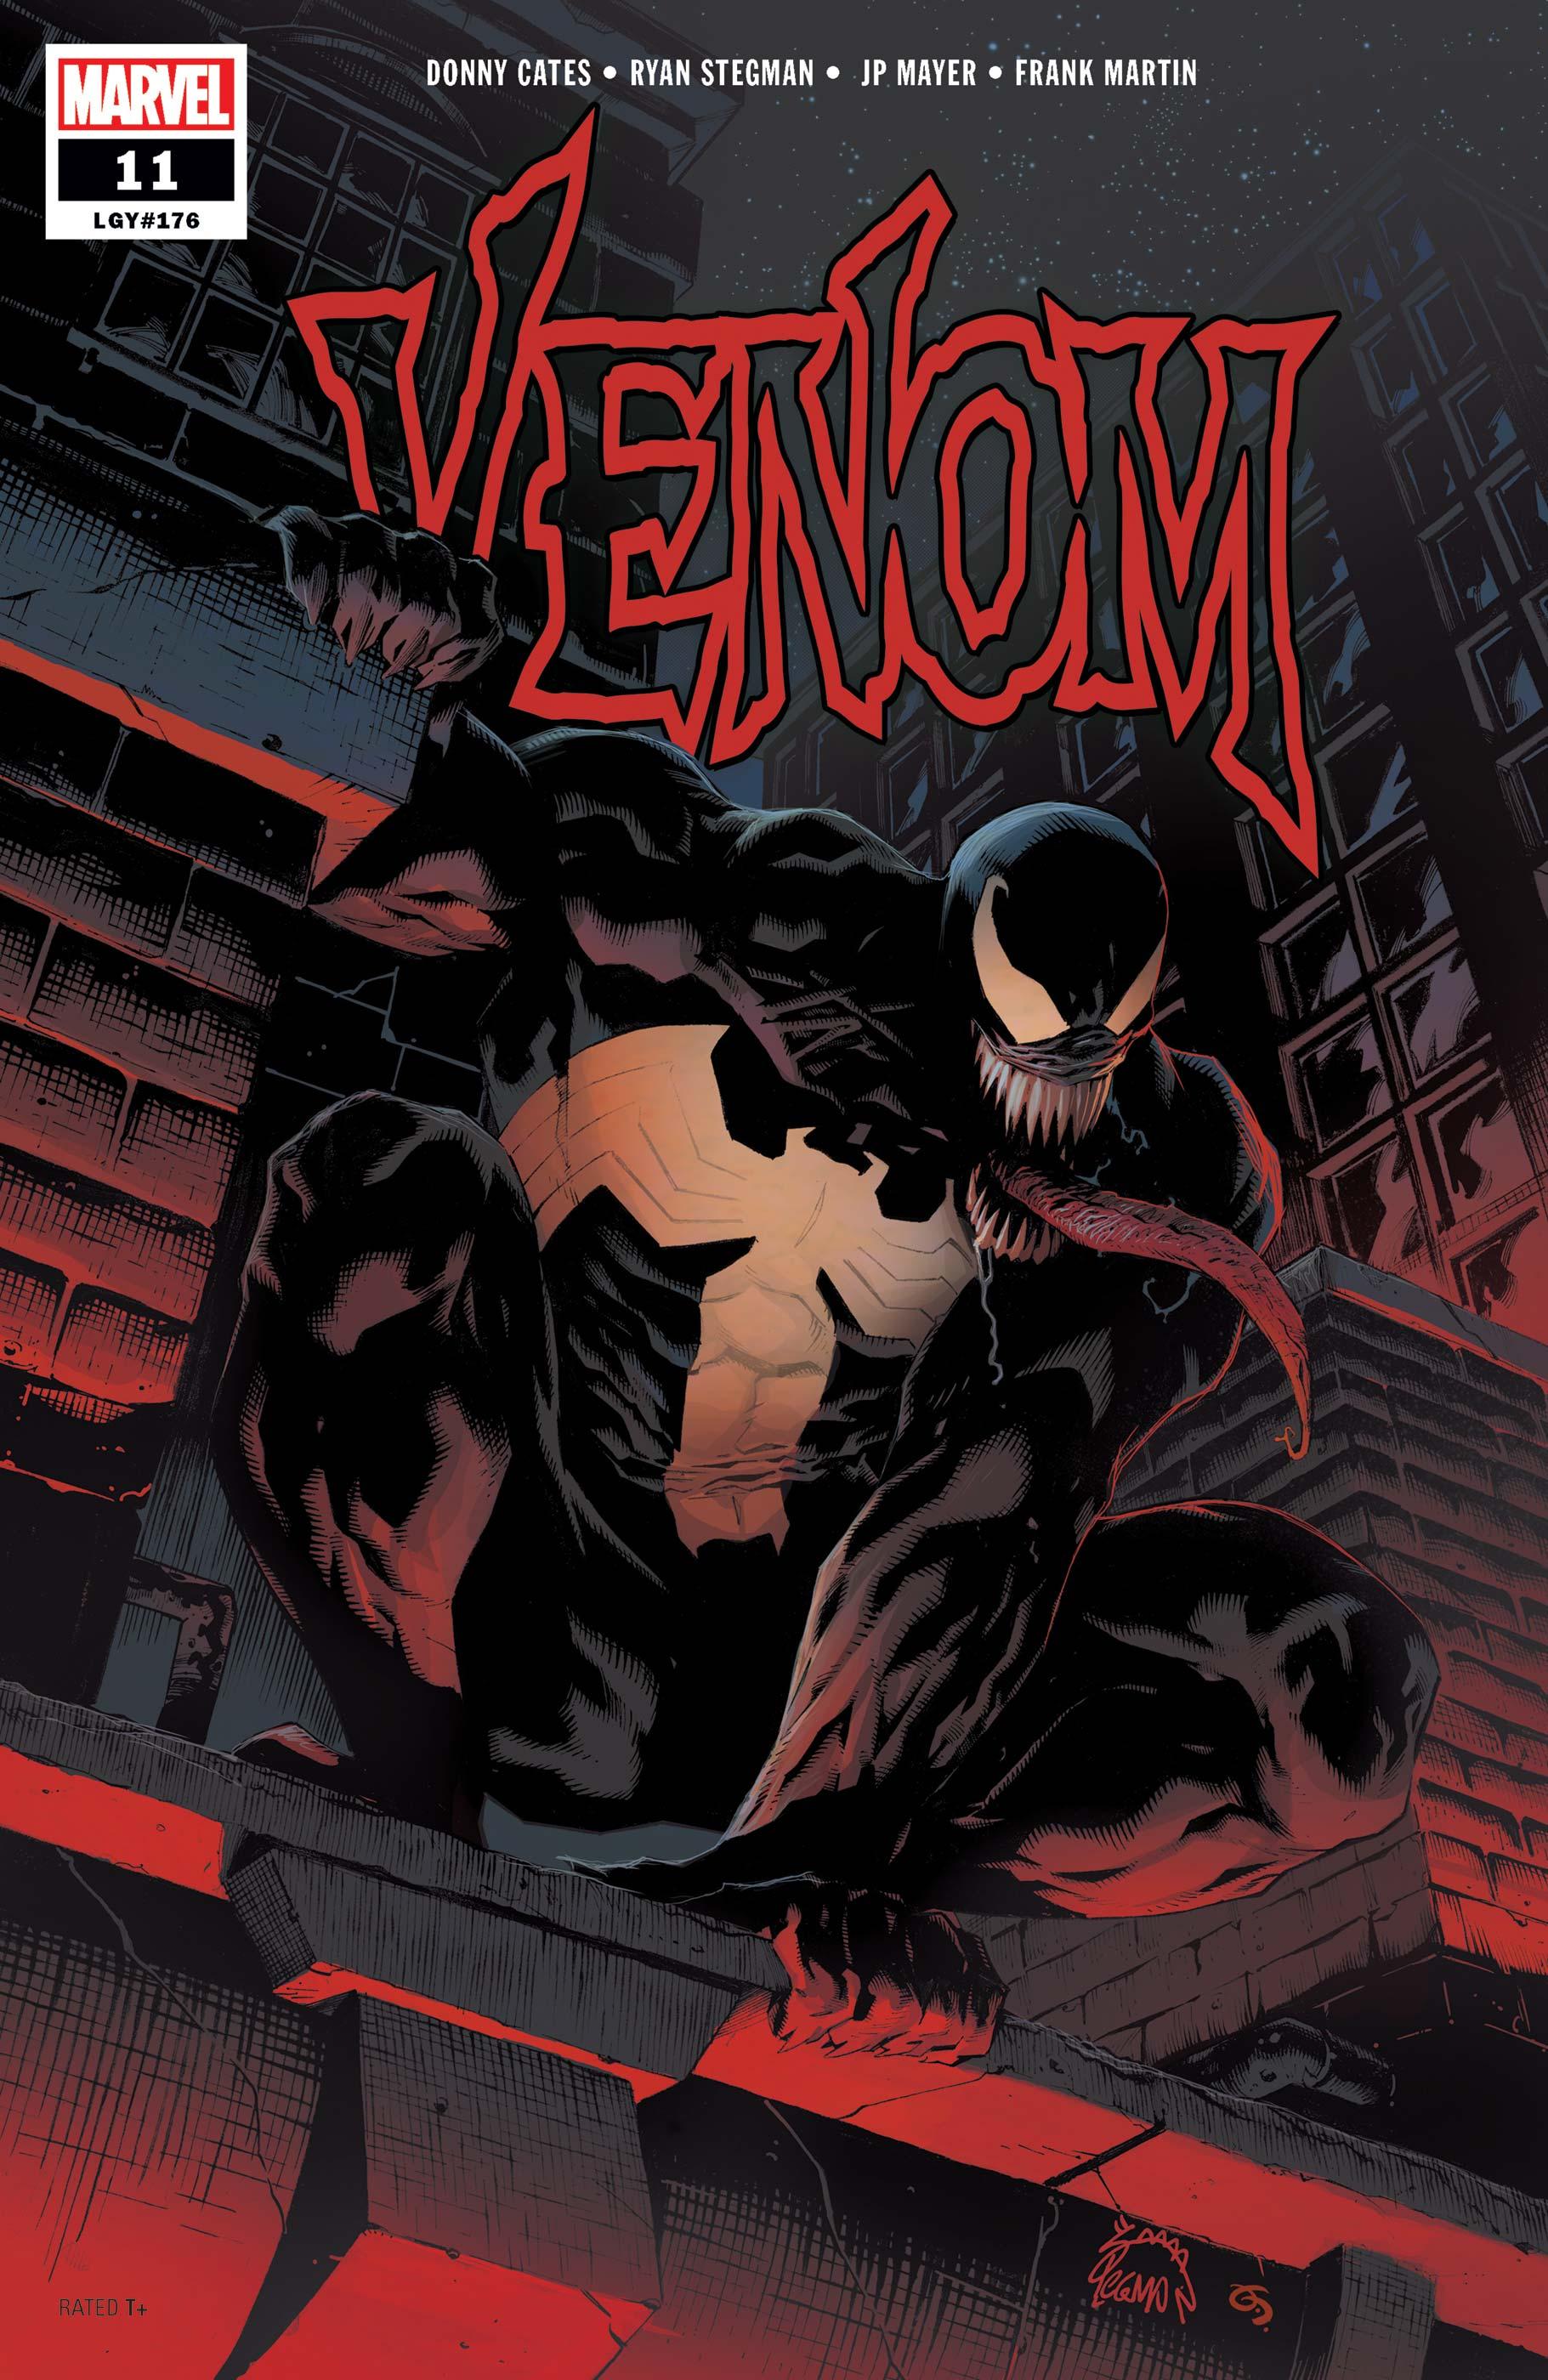 Venom (2018) #11